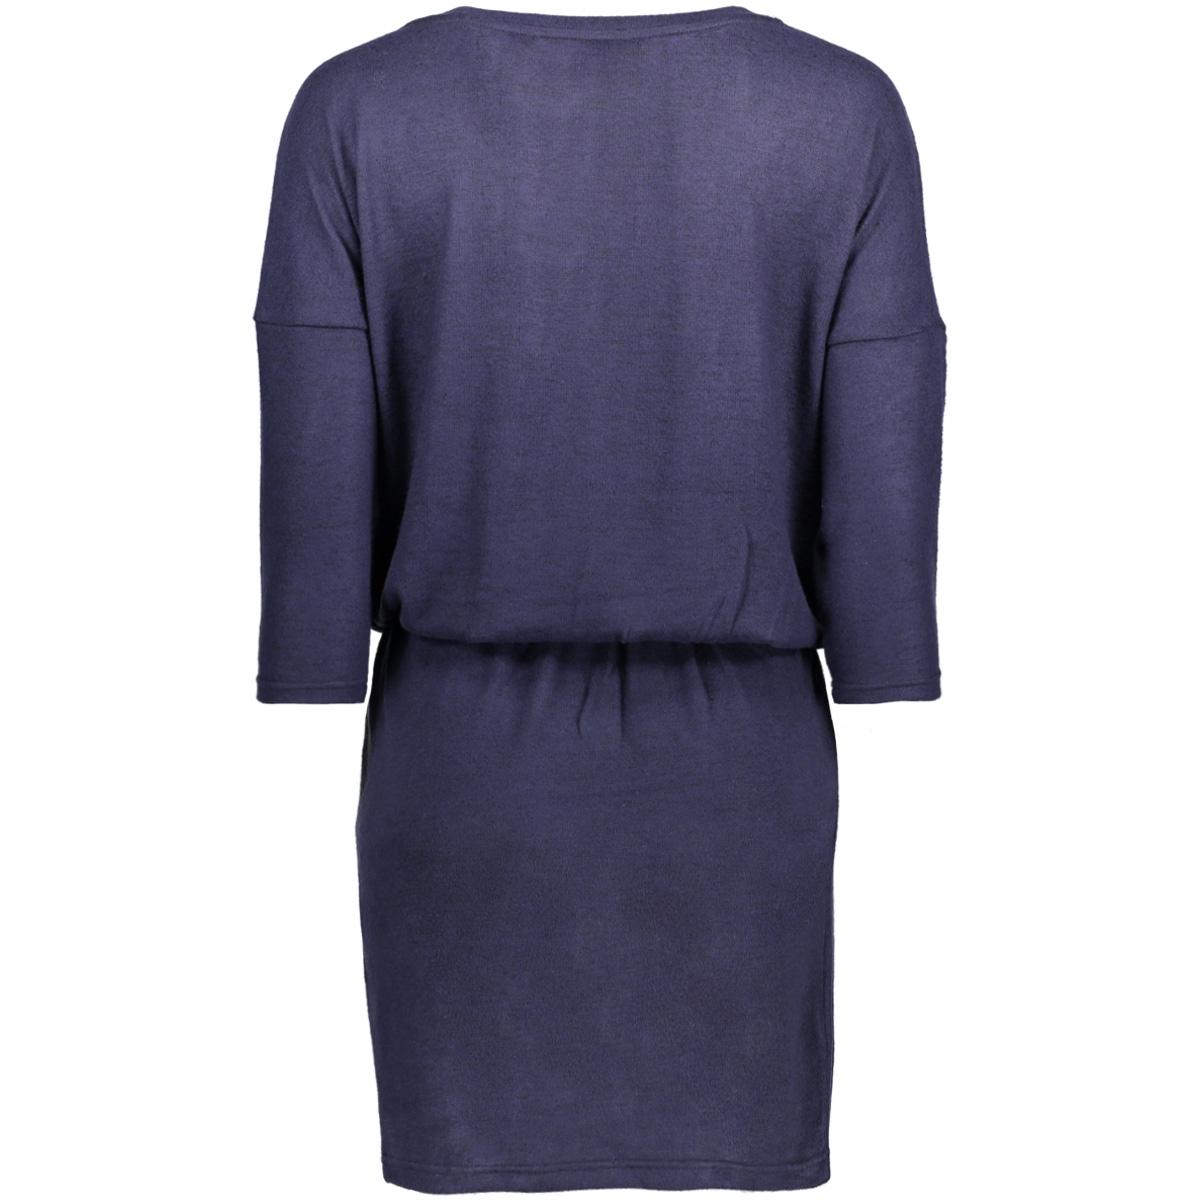 onlmaye 3/4 dress knt 15144817 only jurk sky captain/w.black